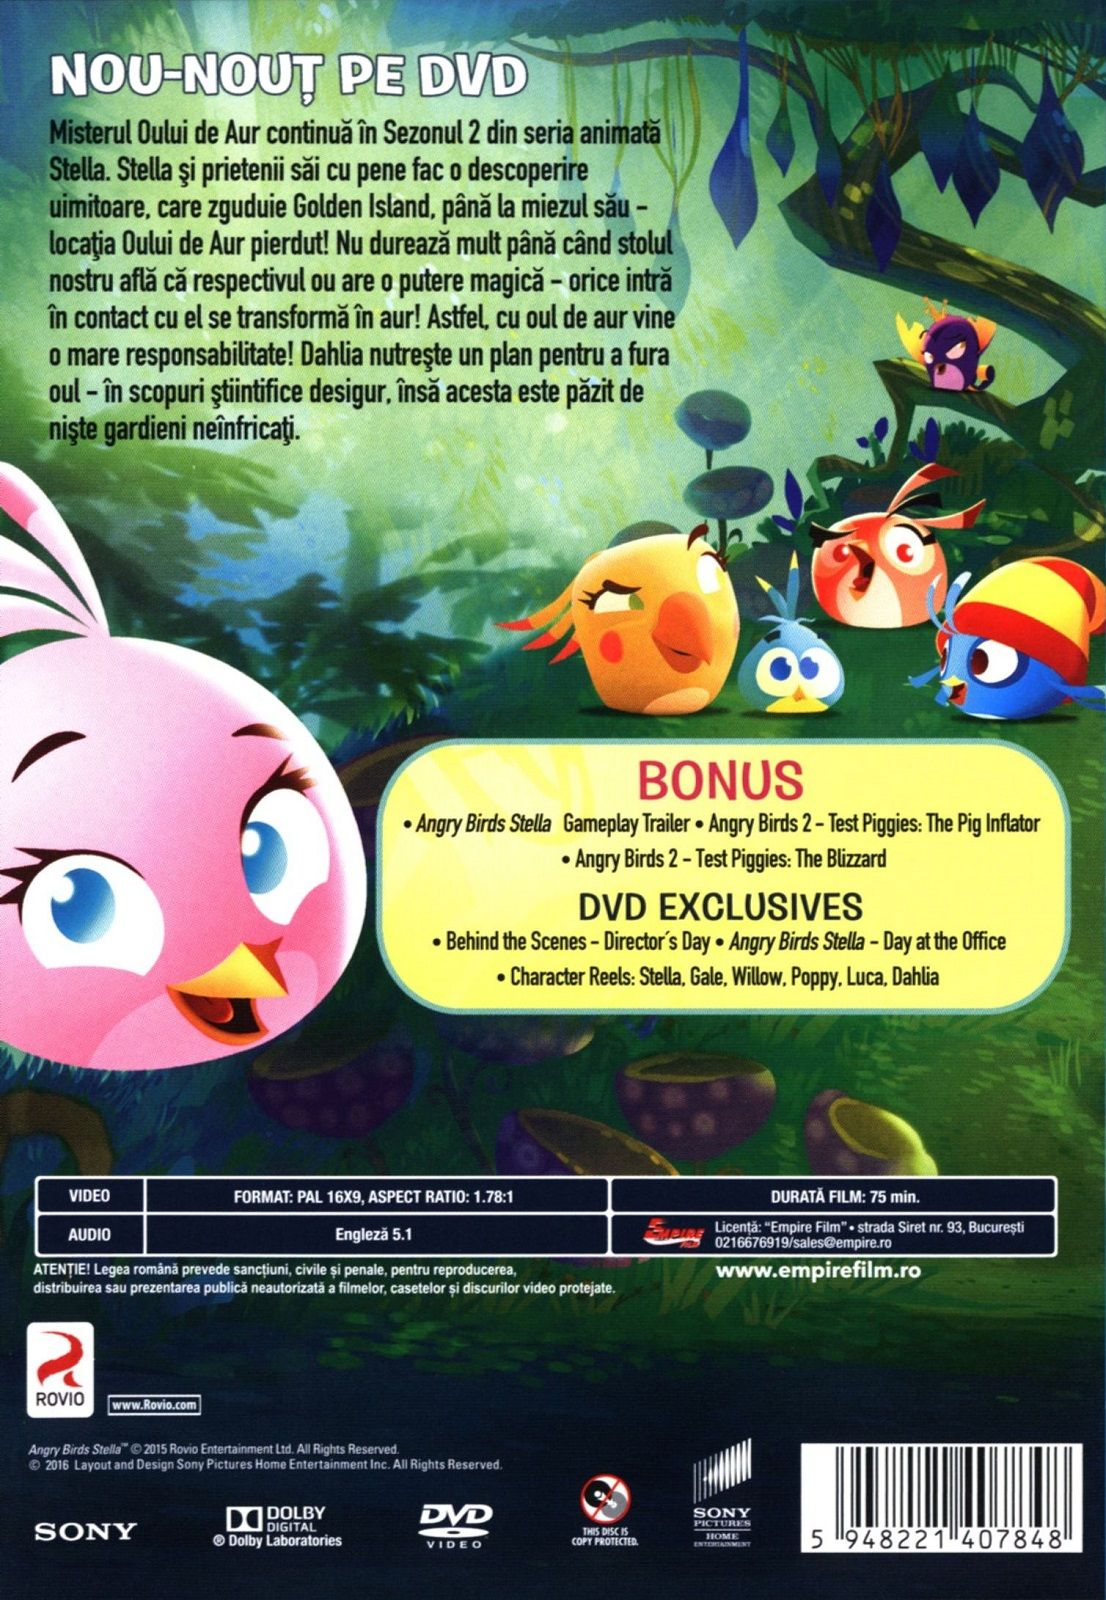 Angry Birds Стела - Втори сезон (DVD) - 2